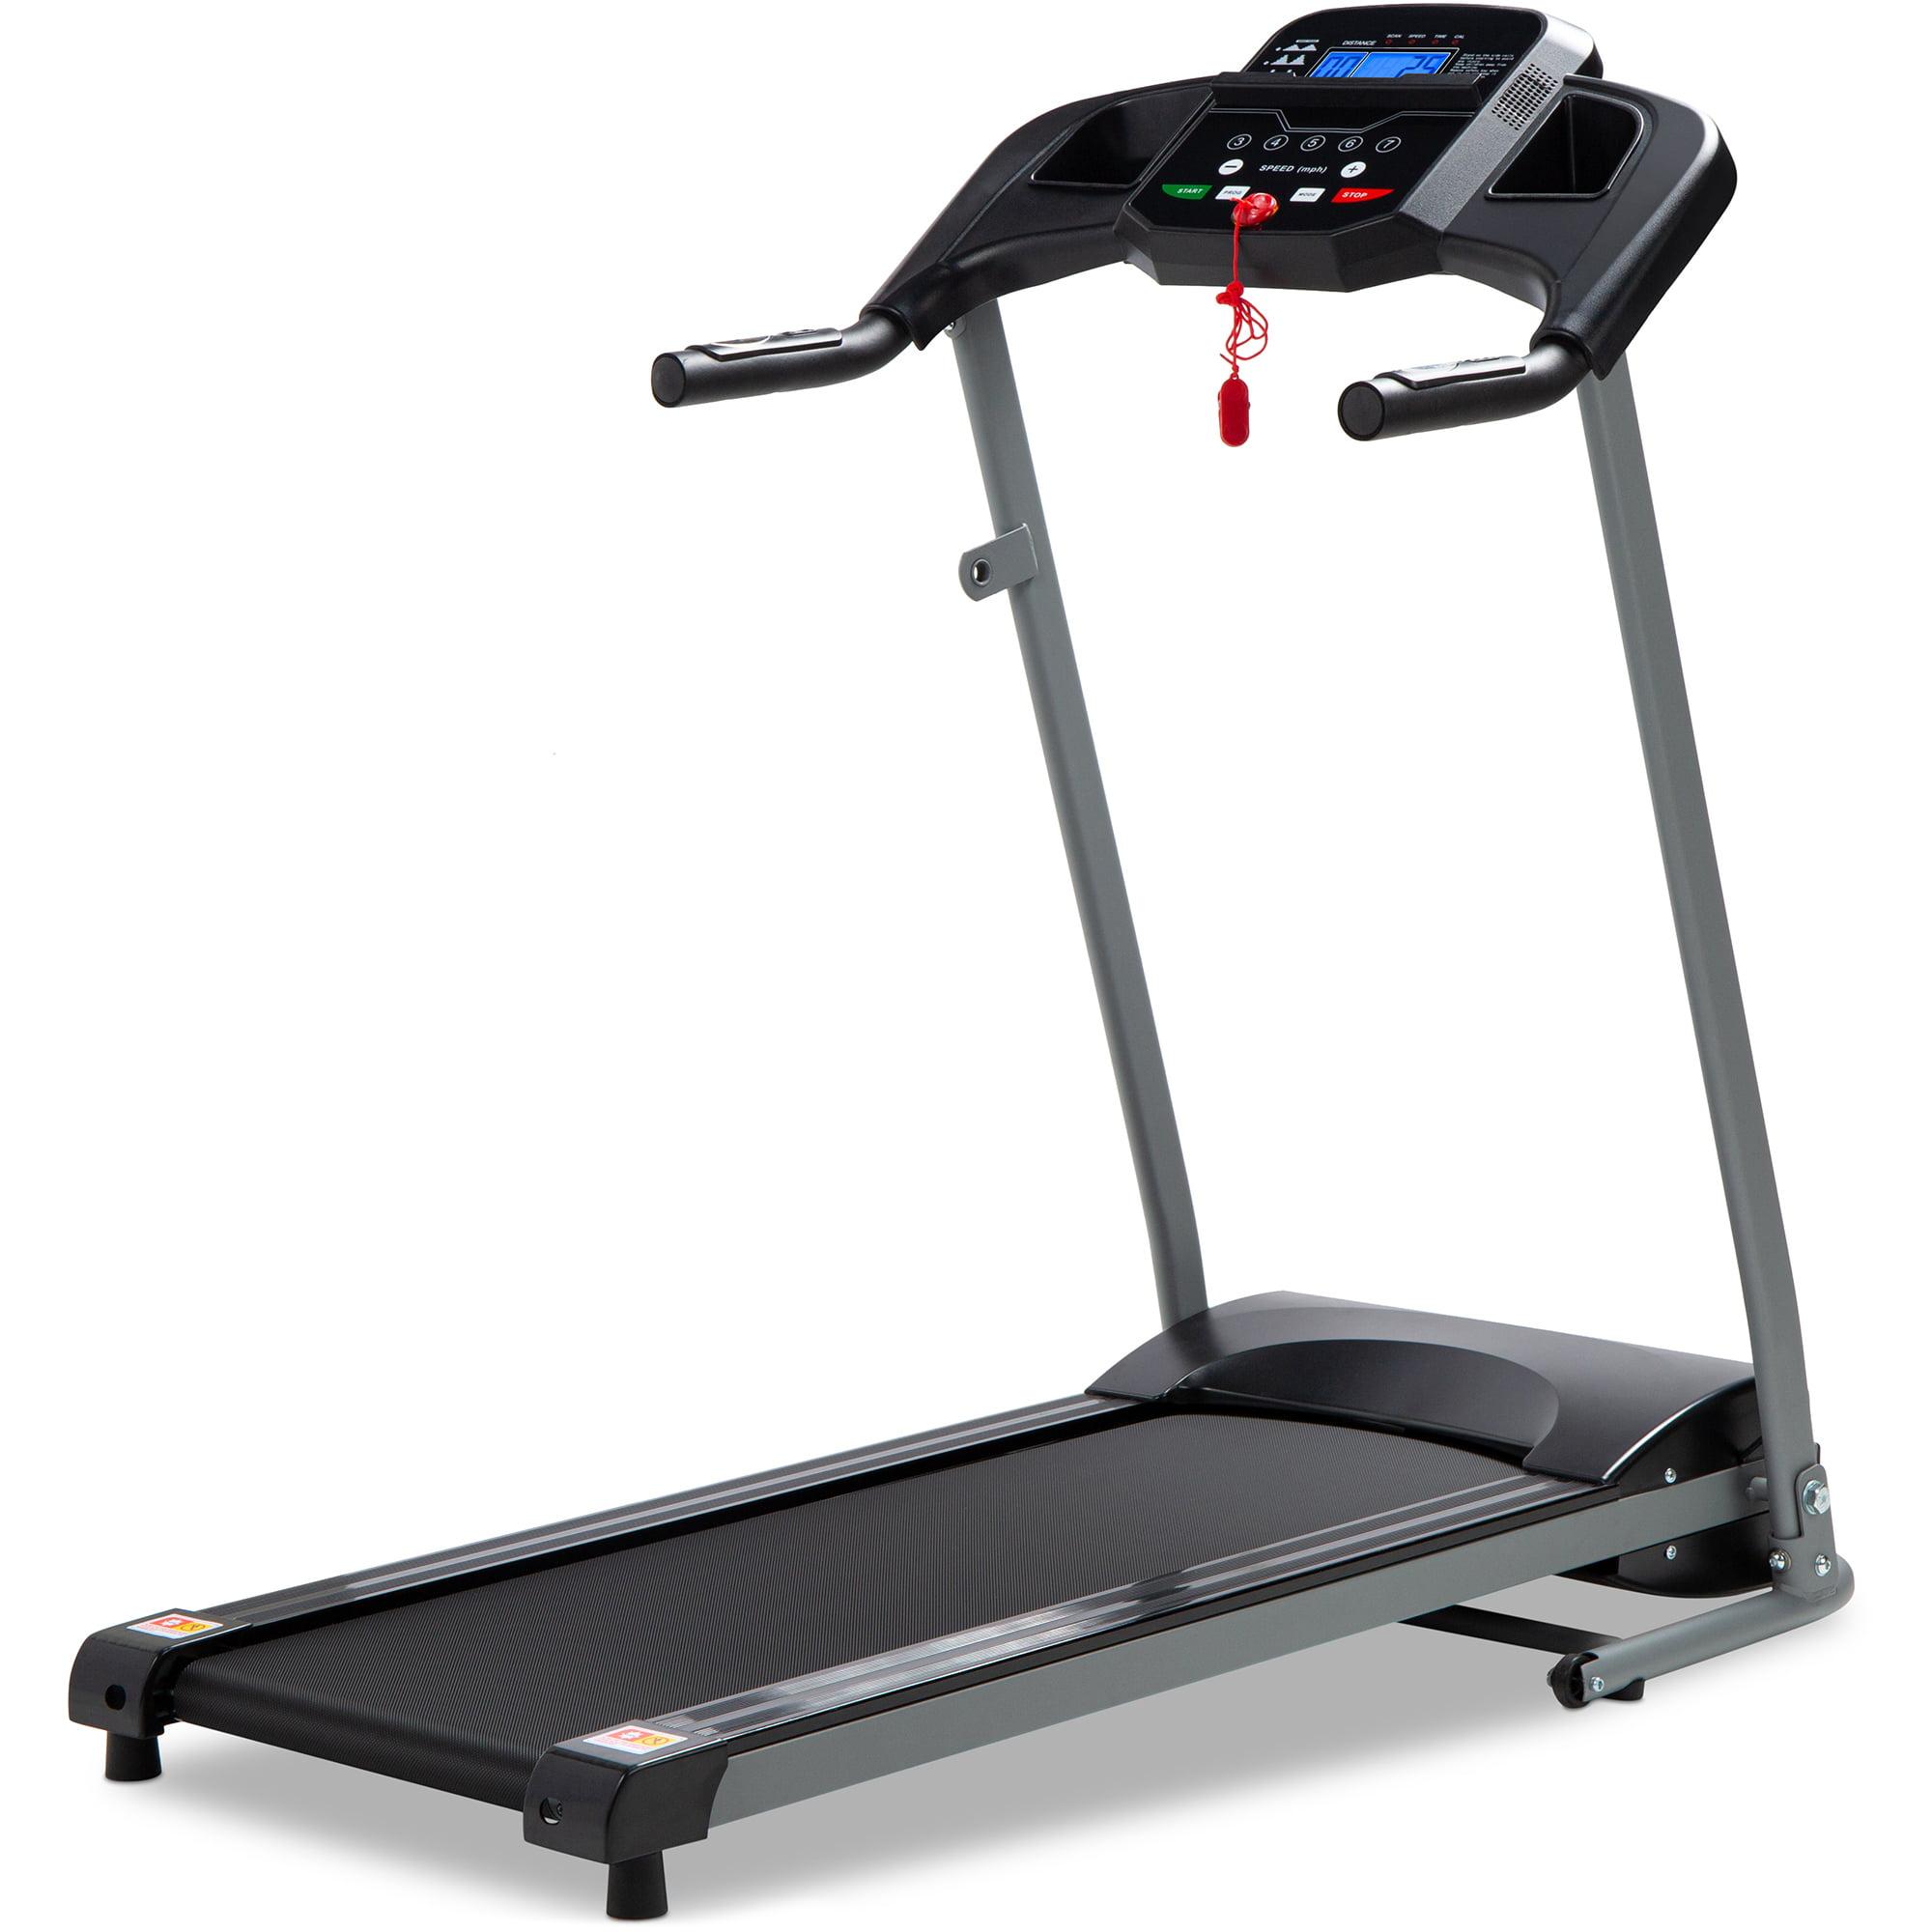 Best Choice Products 800W Portable Folding Electric Motorized Treadmill Machine w/ Rolling Wheels - Black